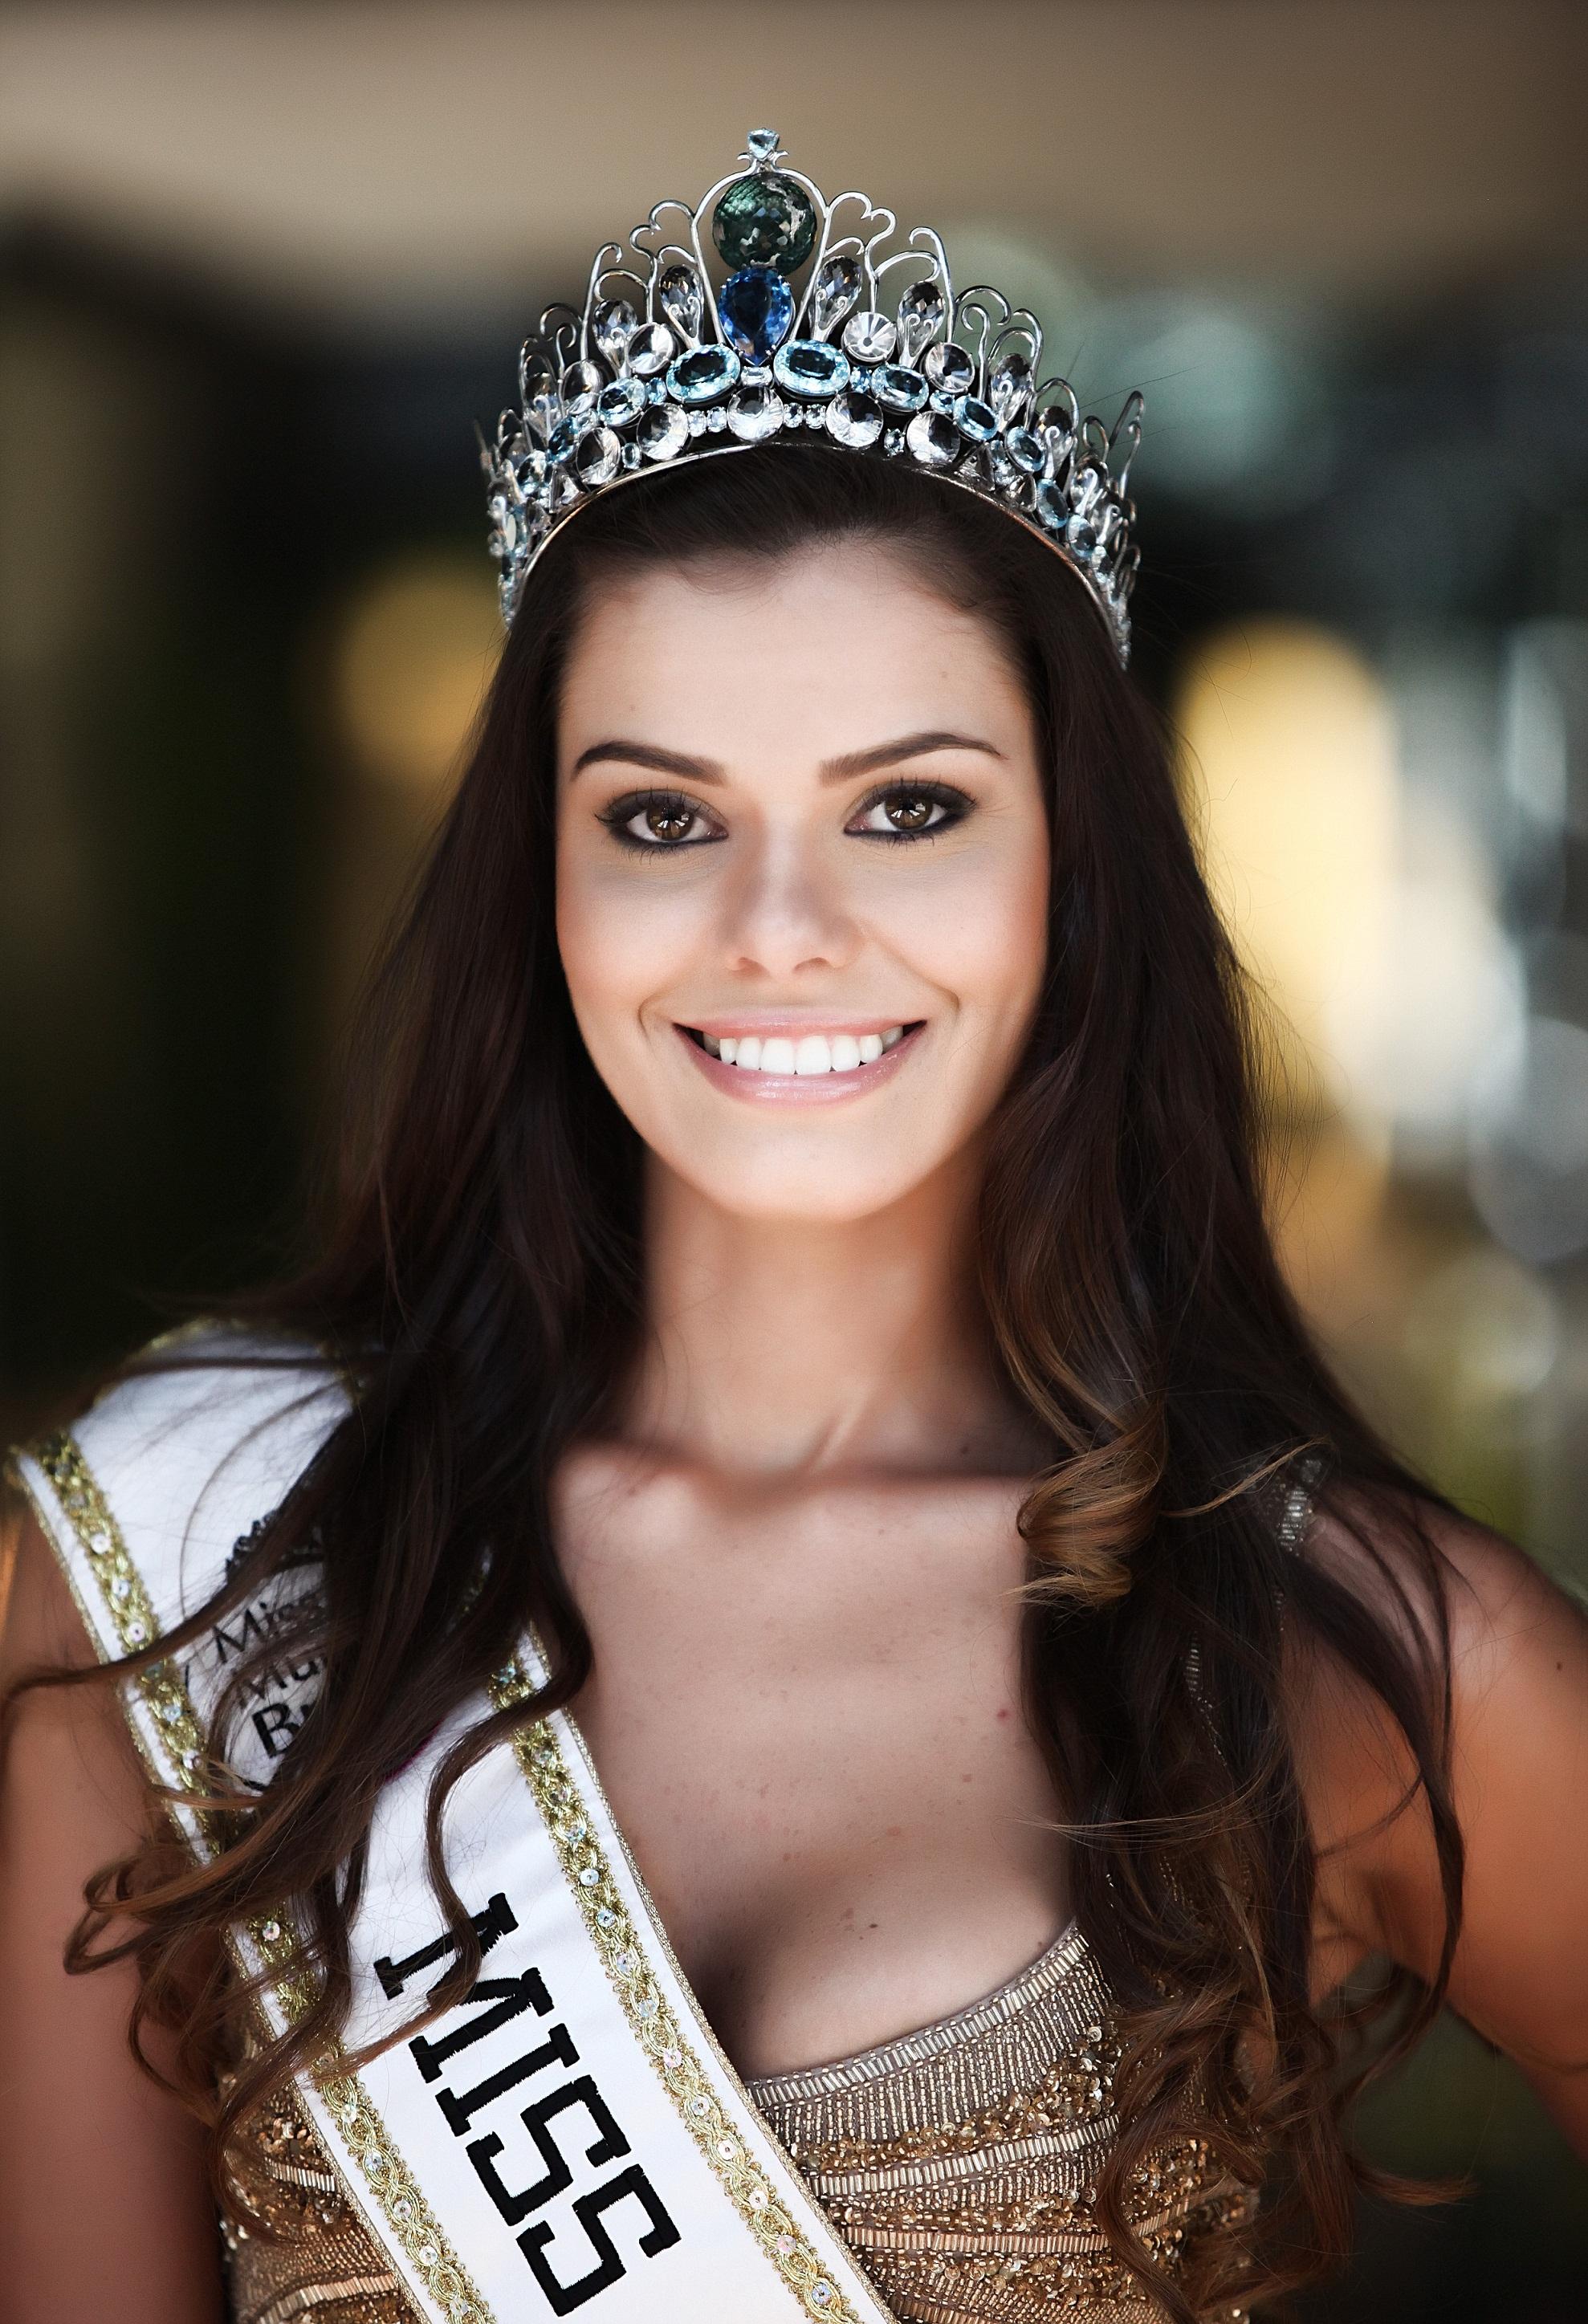 miss mundo brasil 2009, luciana bertolini.  Wgm5s7ba